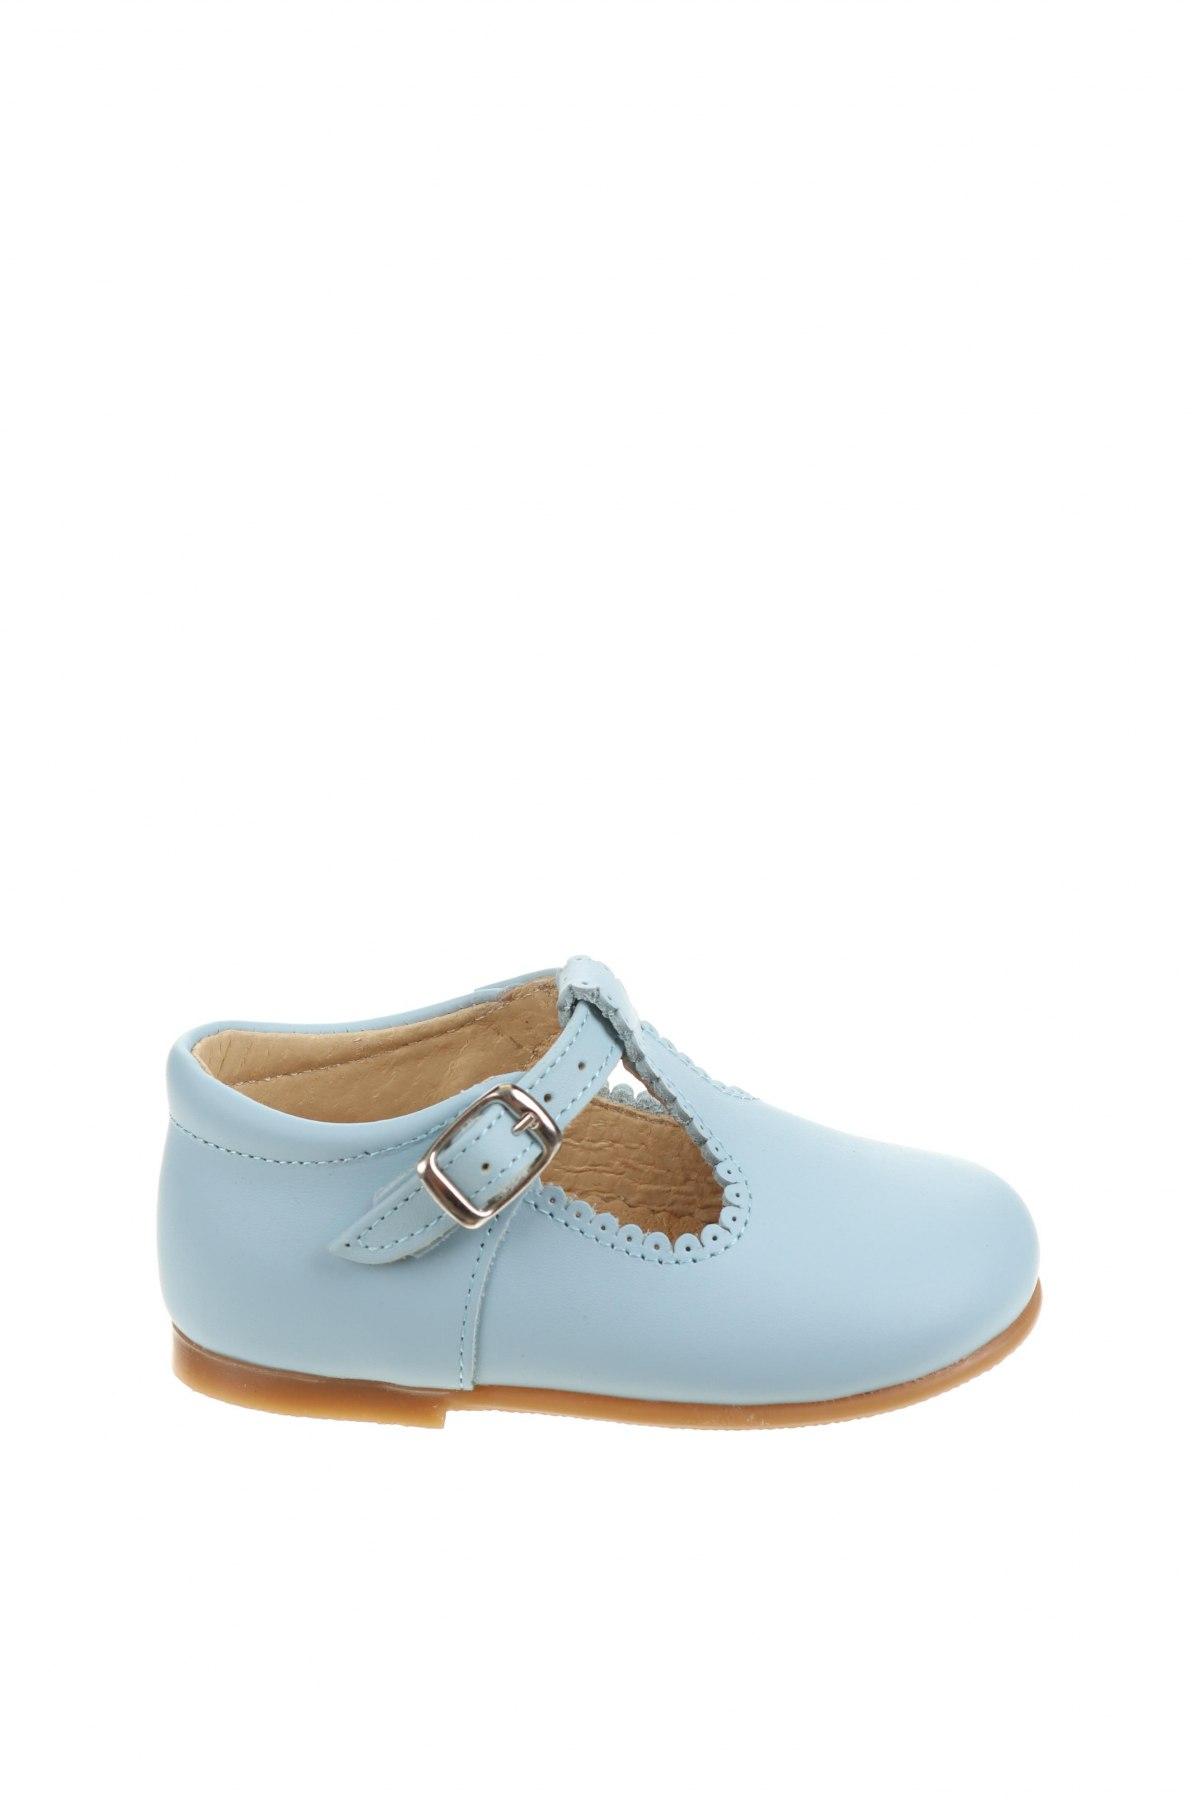 Детски обувки Lola Palacios, Размер 20, Цвят Син, Естествена кожа, Цена 29,37лв.